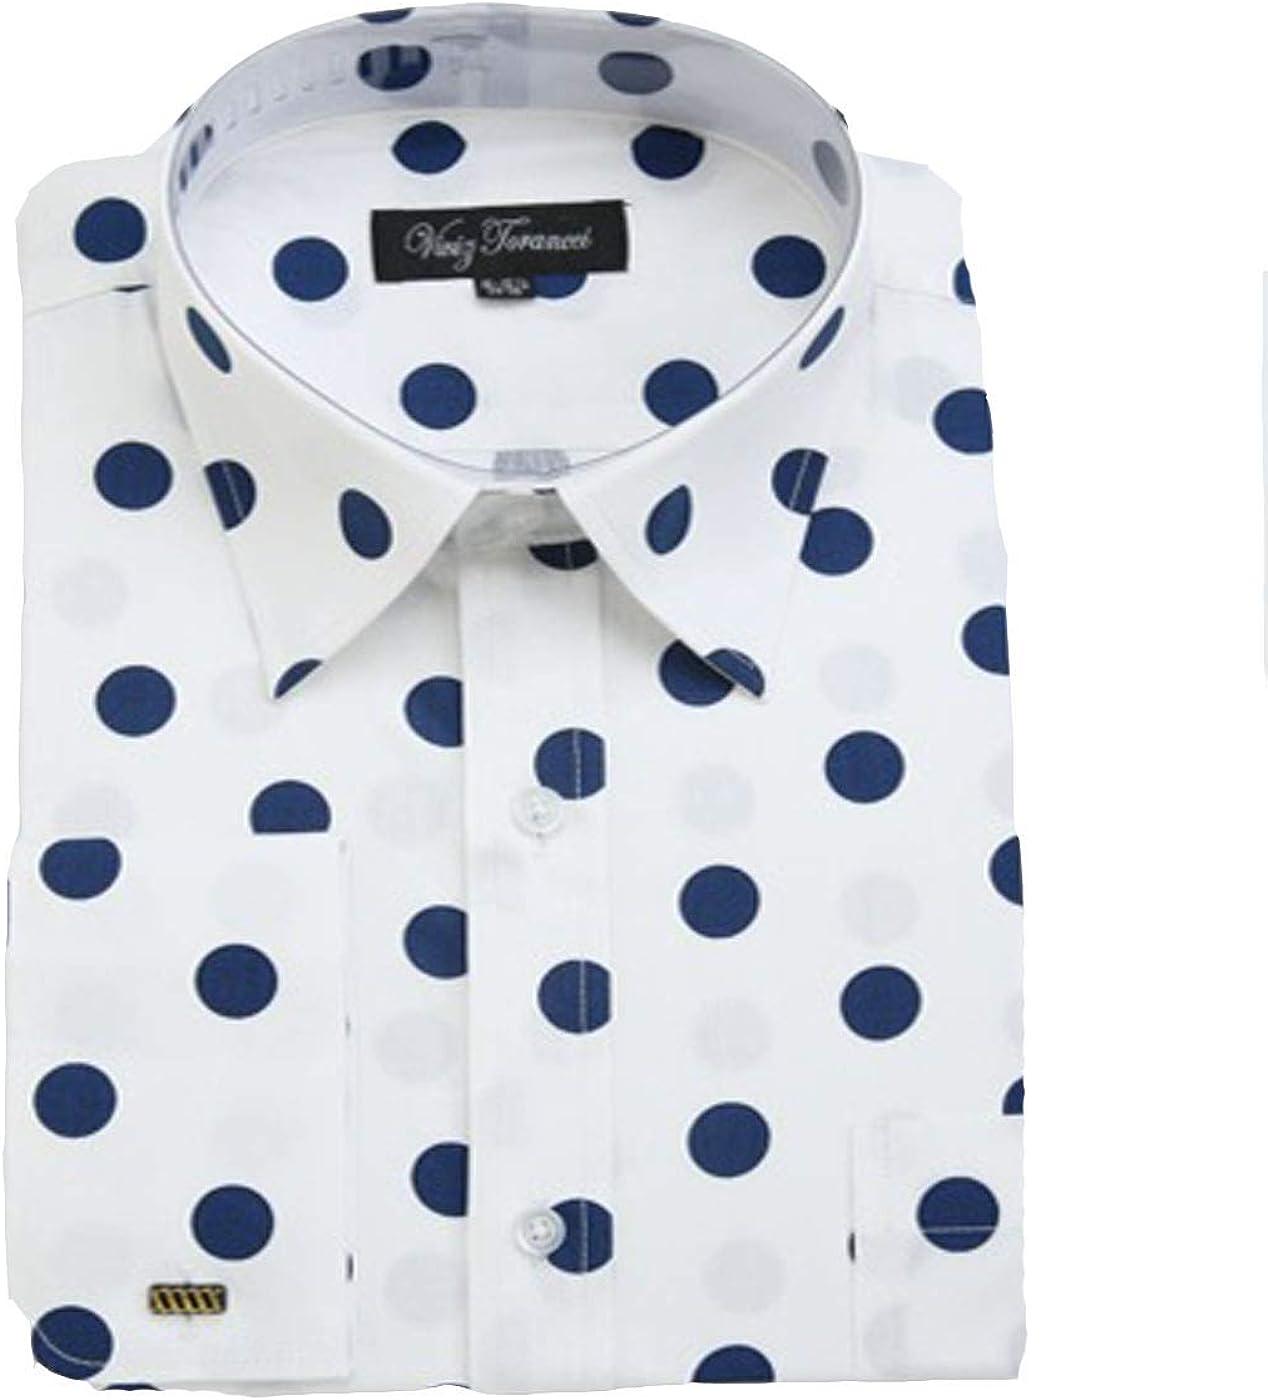 Viviz Forancci Men's Cotton Long Sleeve Polka Dot Dress Shirt AC401